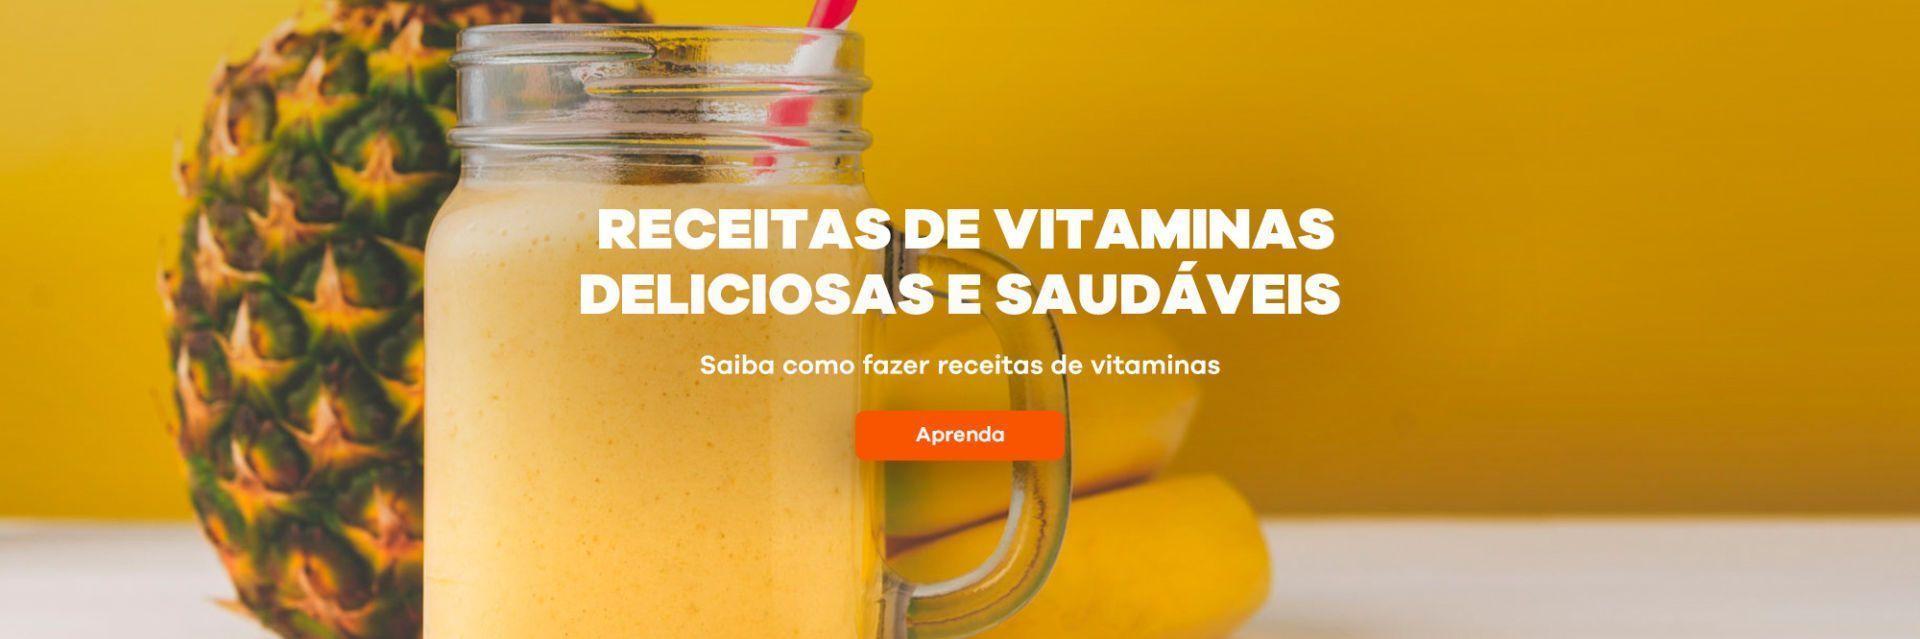 Receitas de Vitaminas